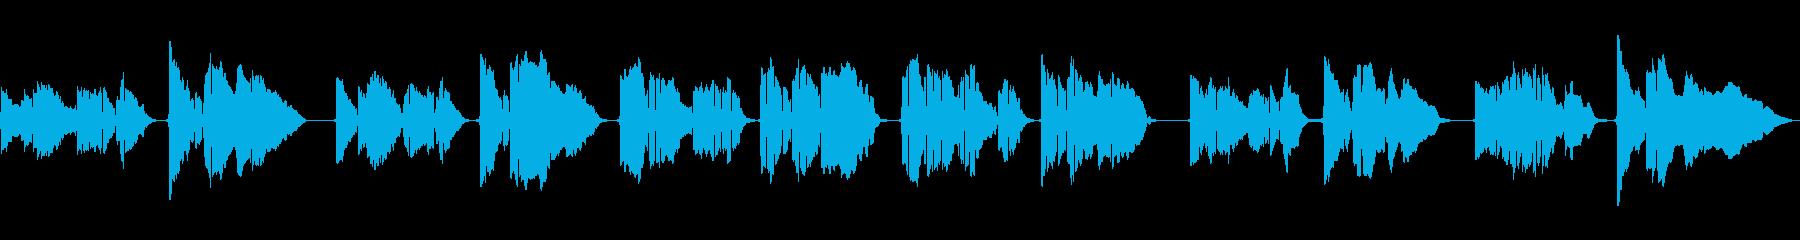 SAXのソロ演奏 抒情詩のようなメロの再生済みの波形